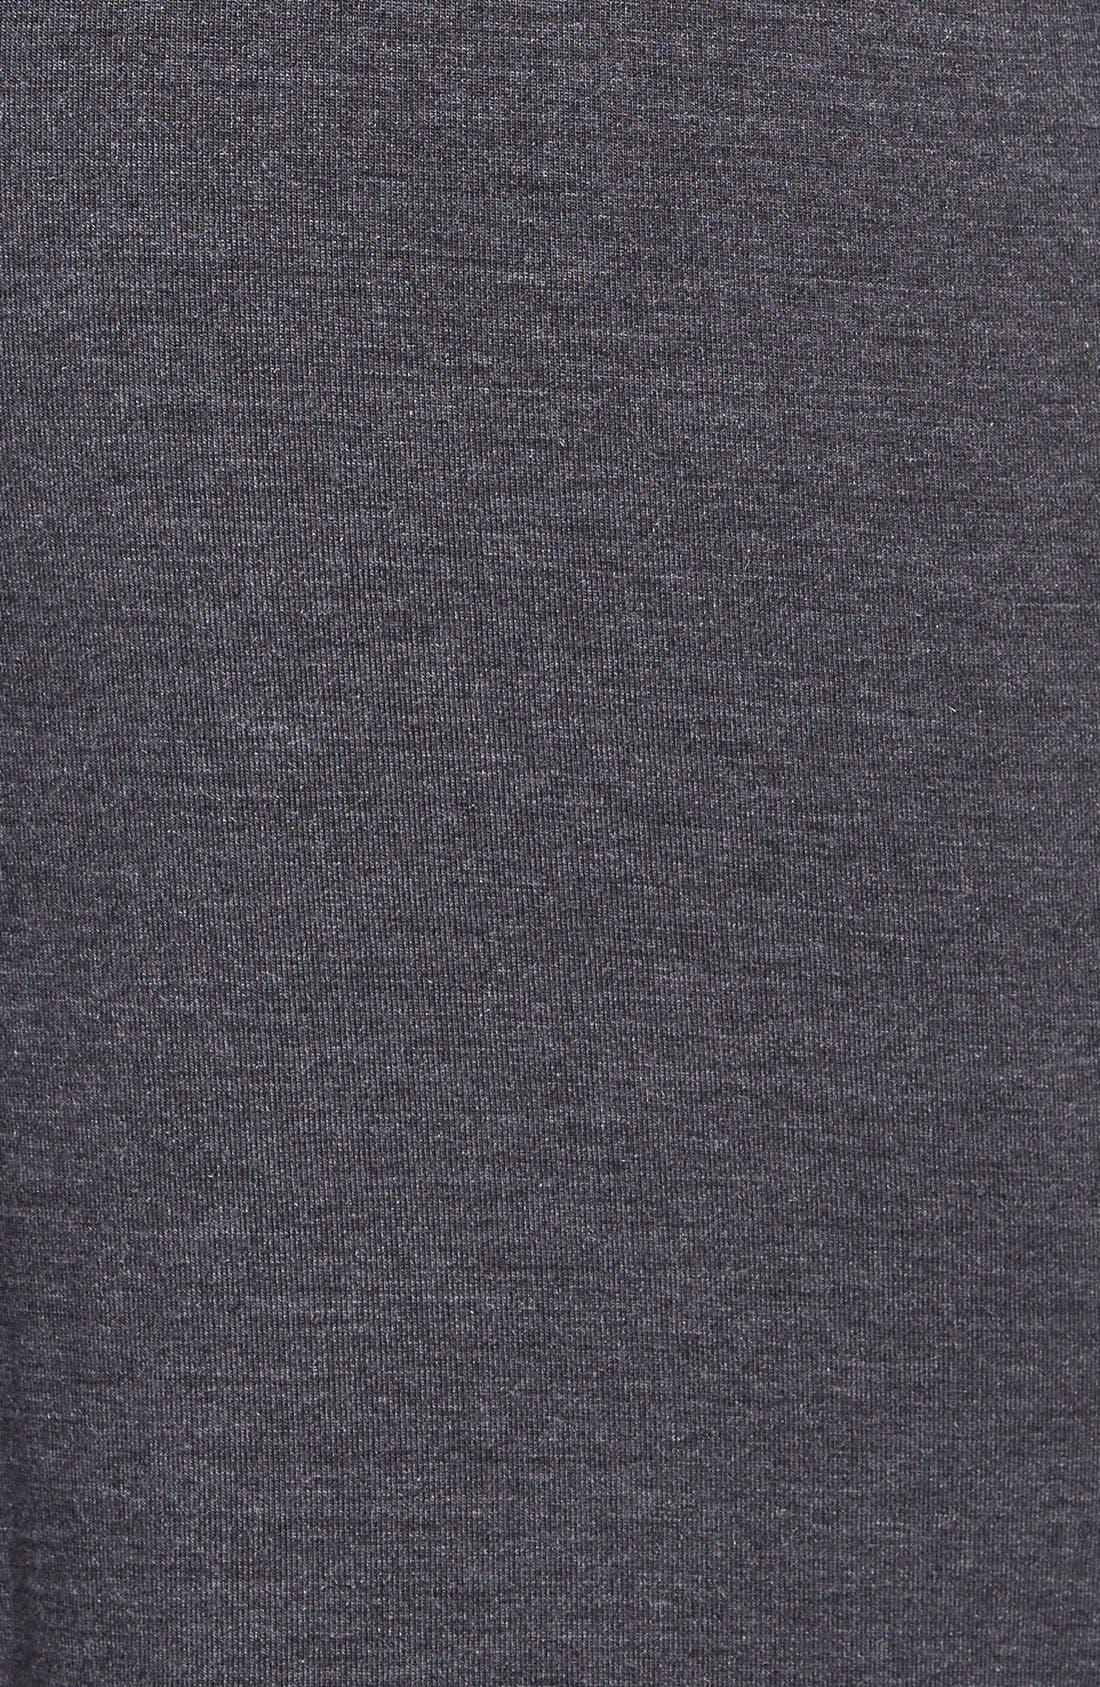 Alternate Image 3  - DKNY 'Urban Essentials' Lounge Pants